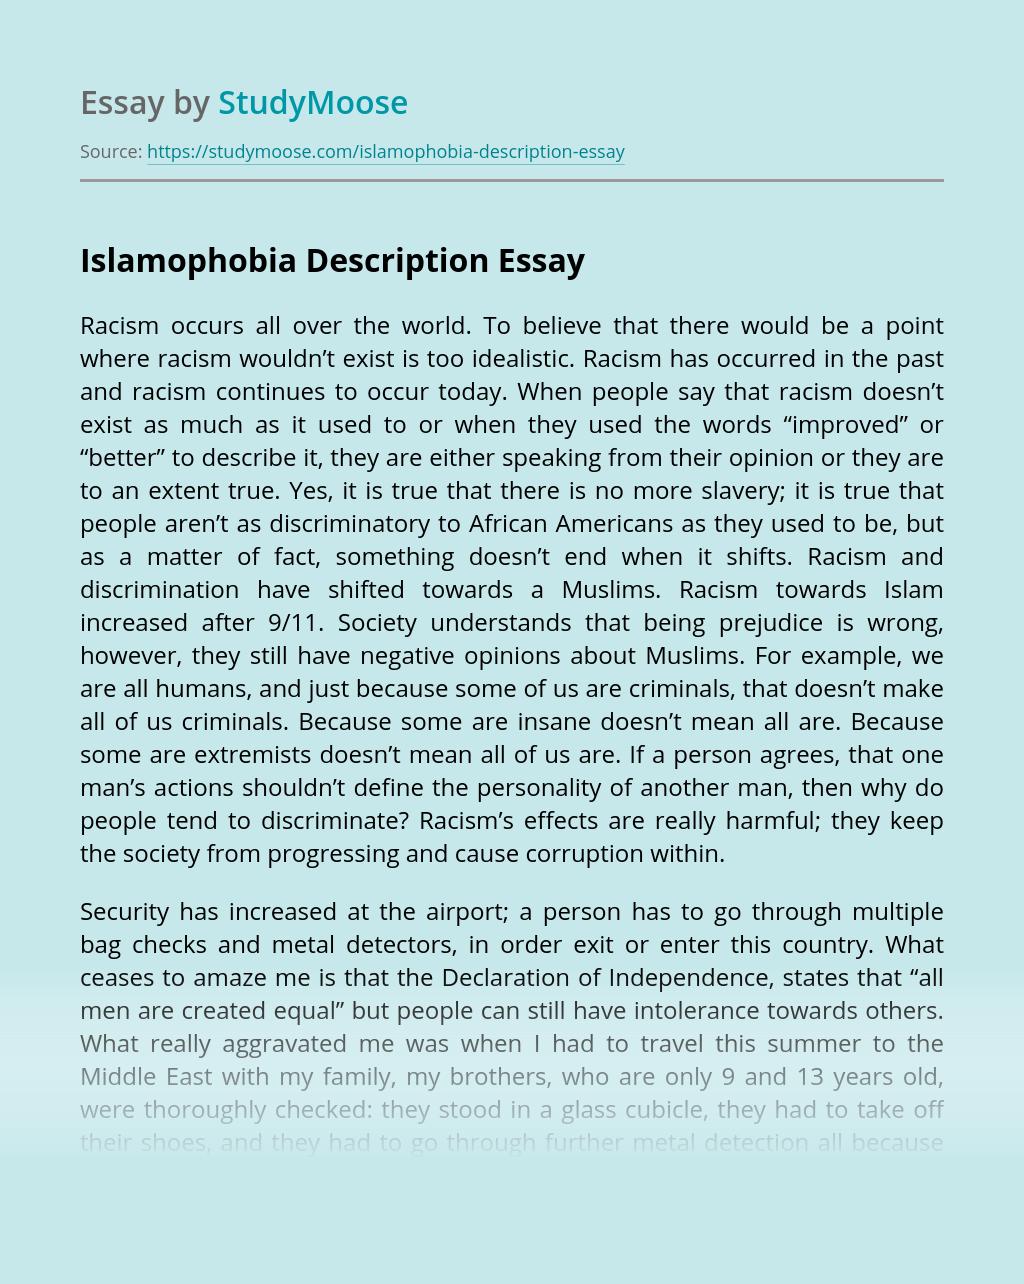 Islamophobia Description